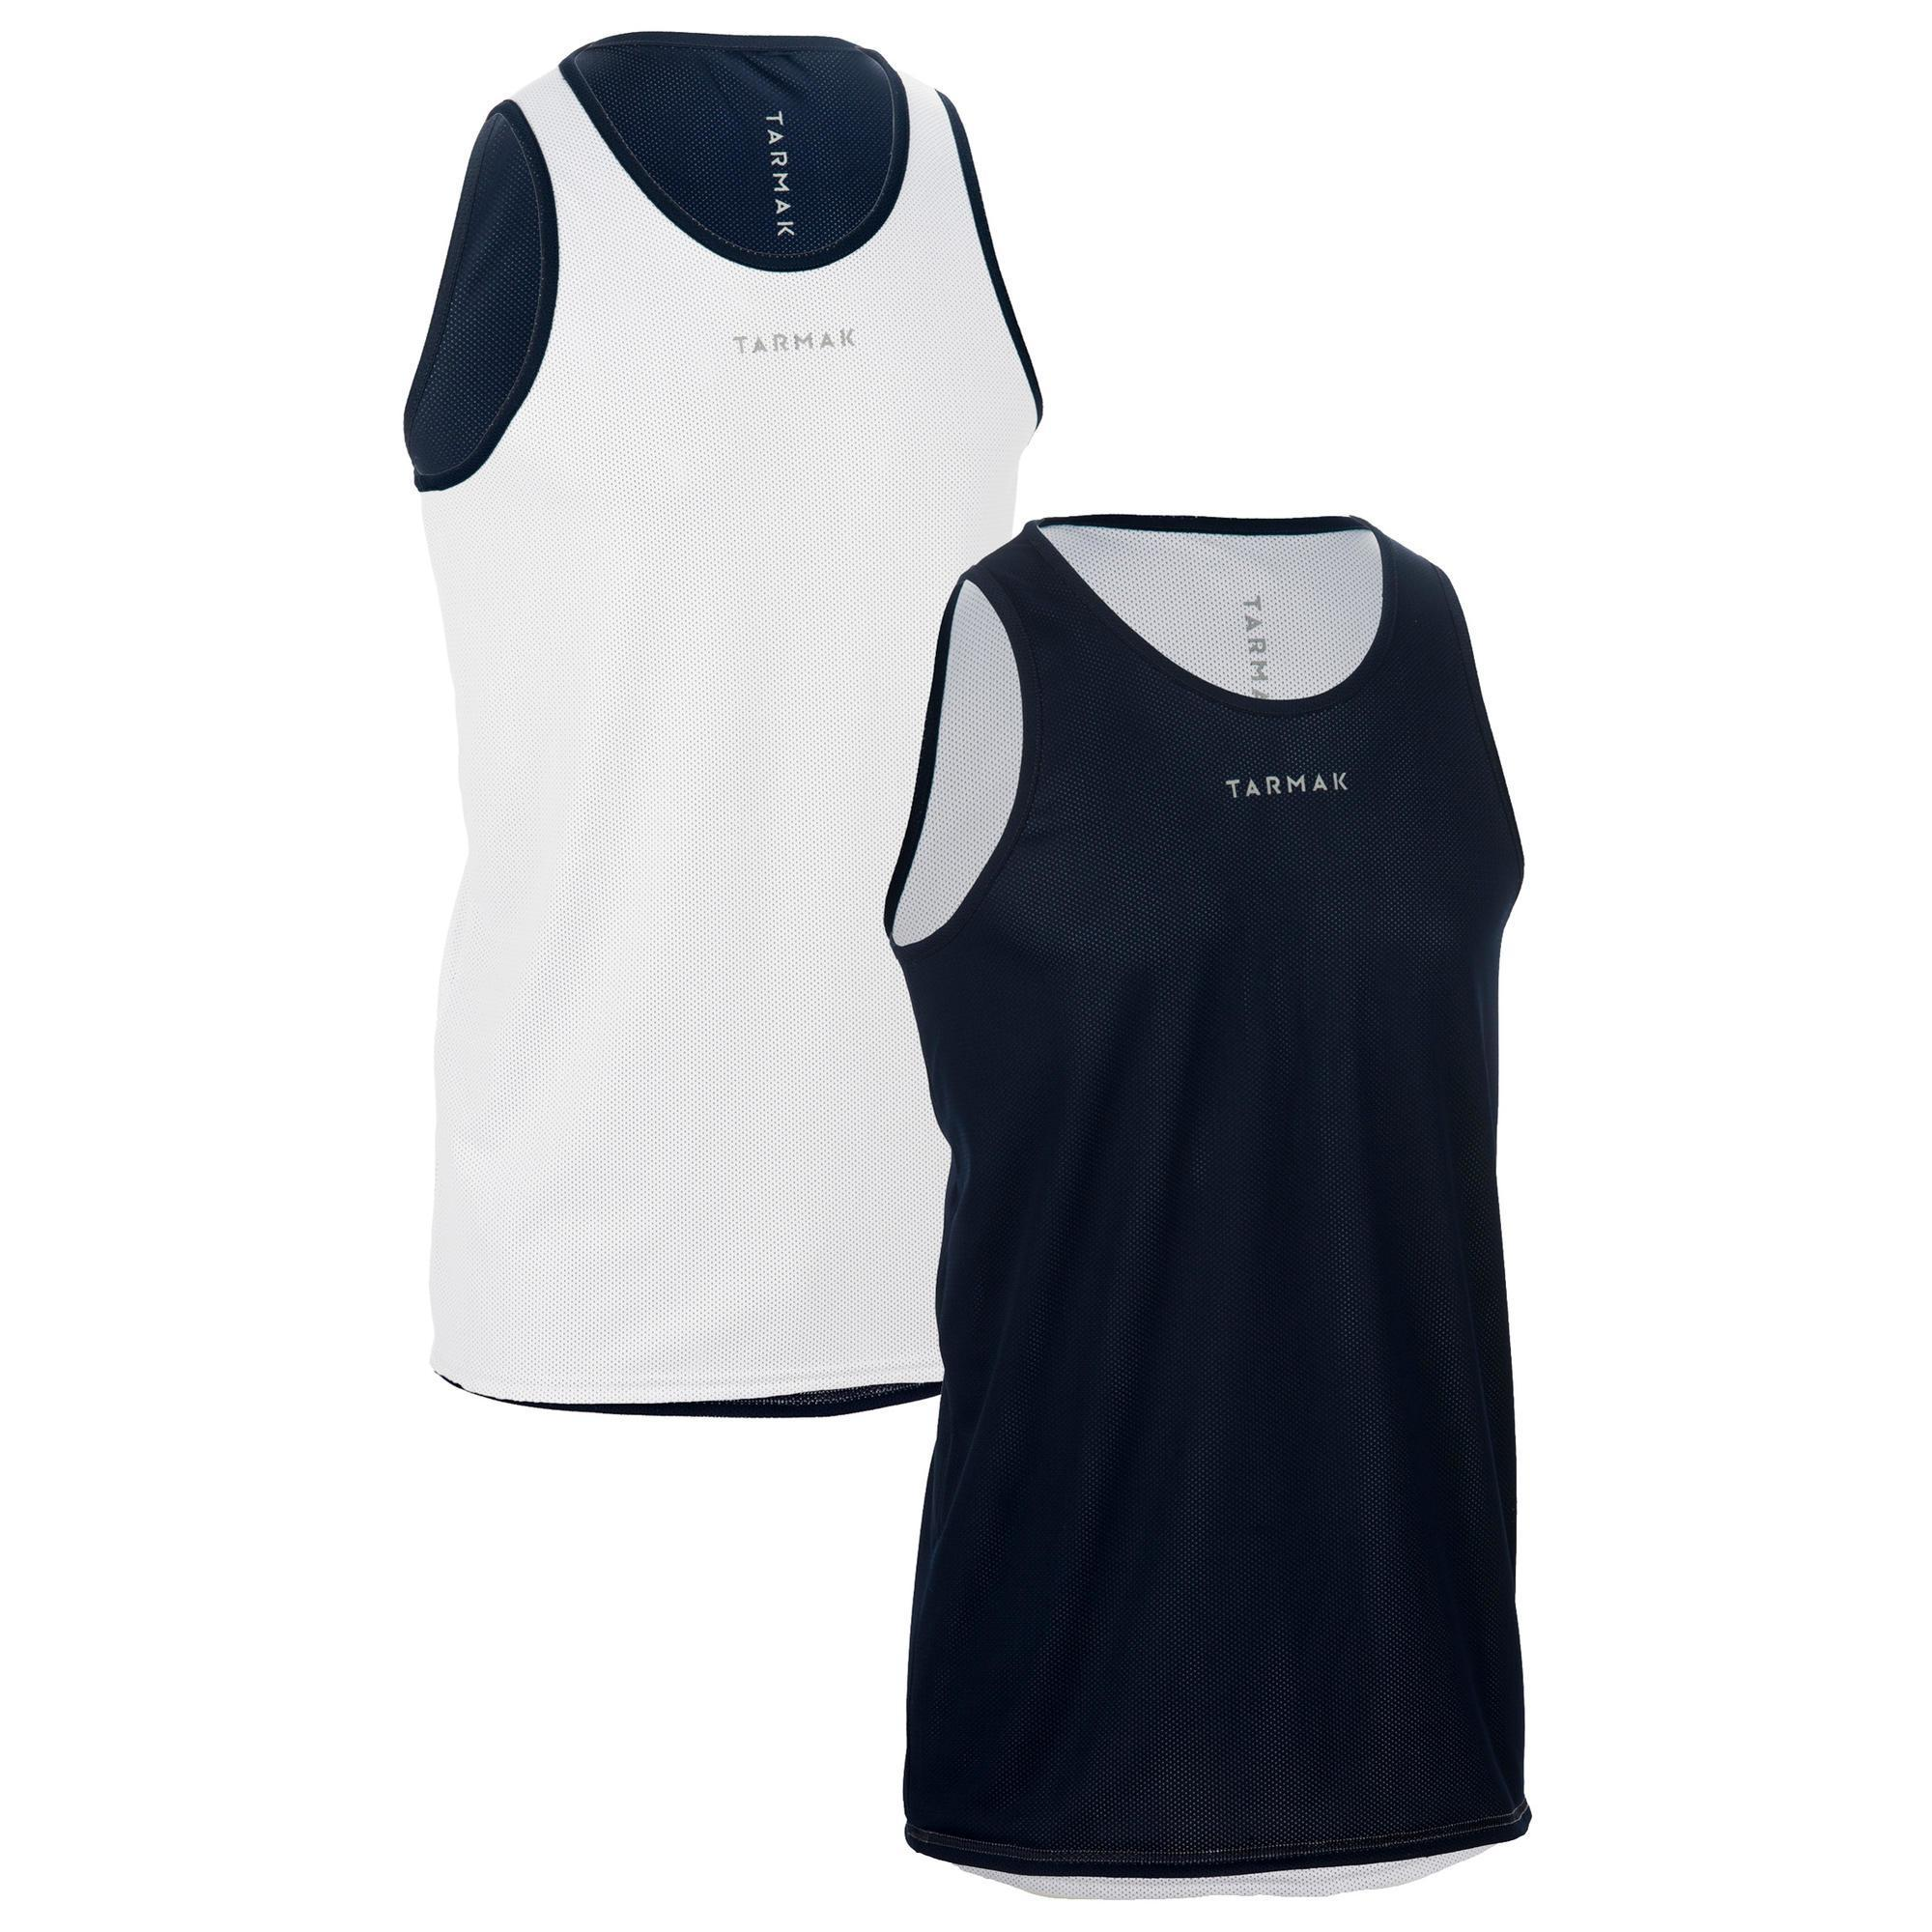 Tarmak Basketbalshirt reversable